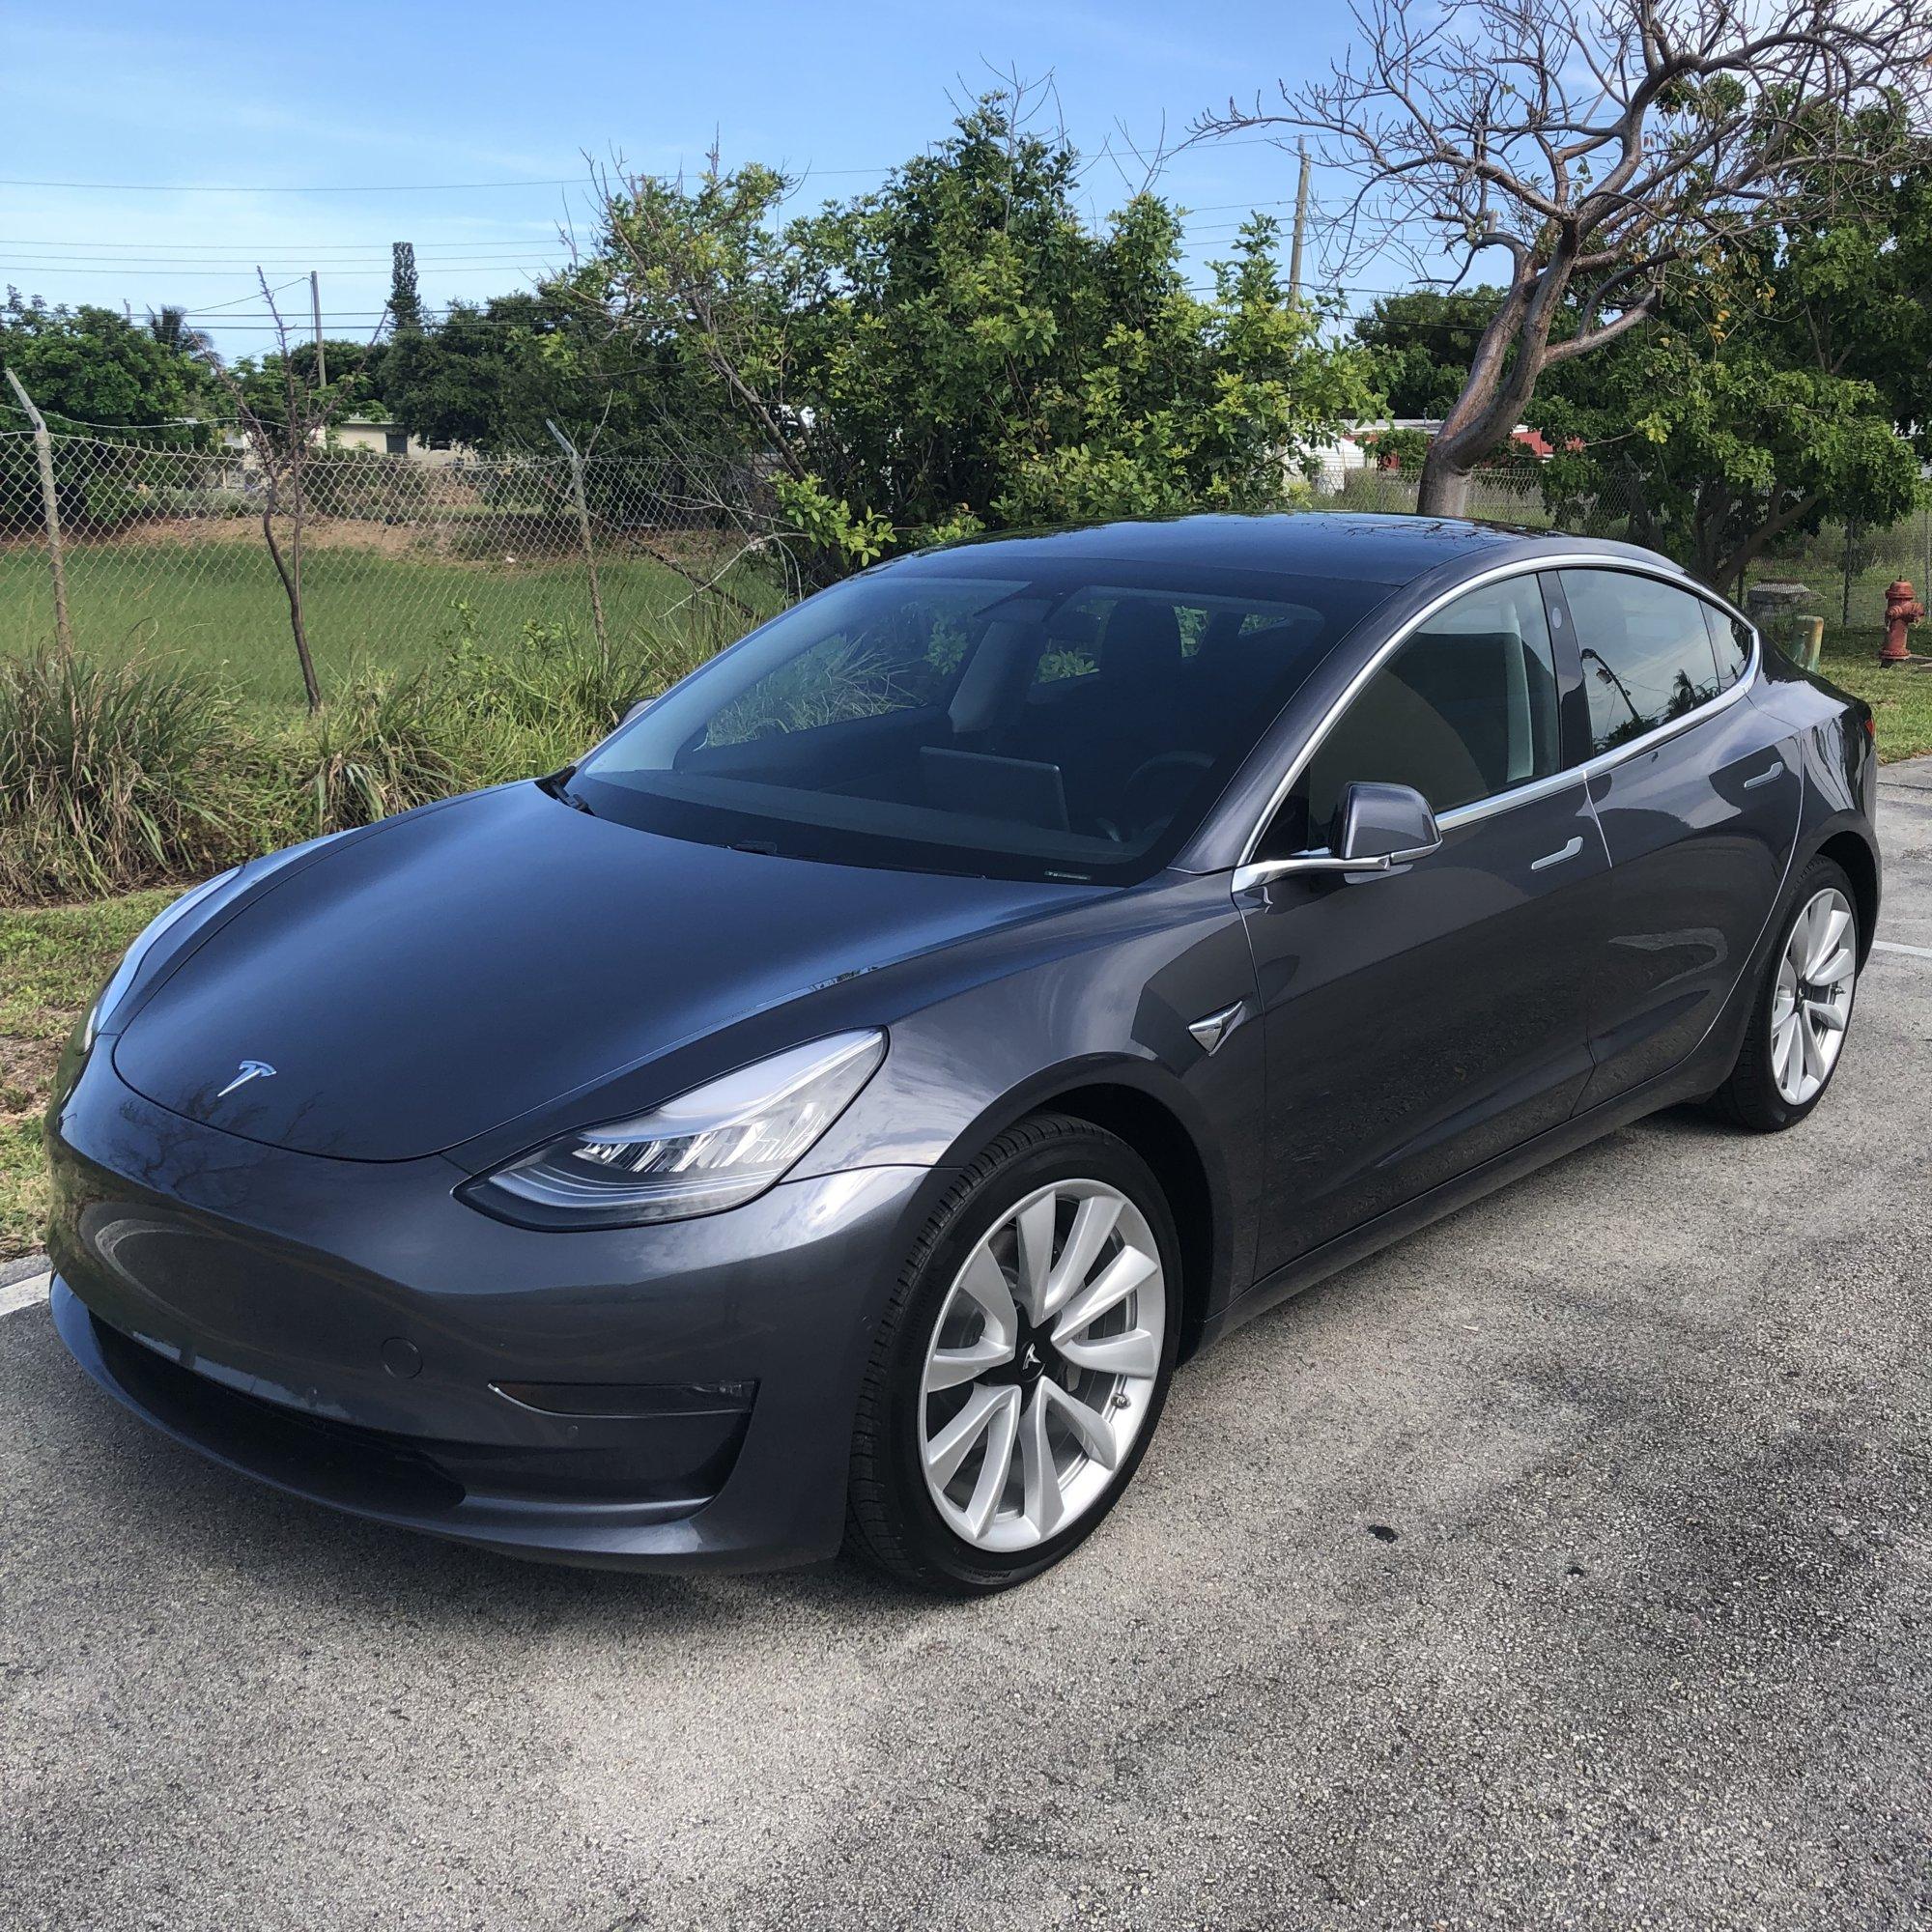 Mike-Model-3-Tesla.jpg